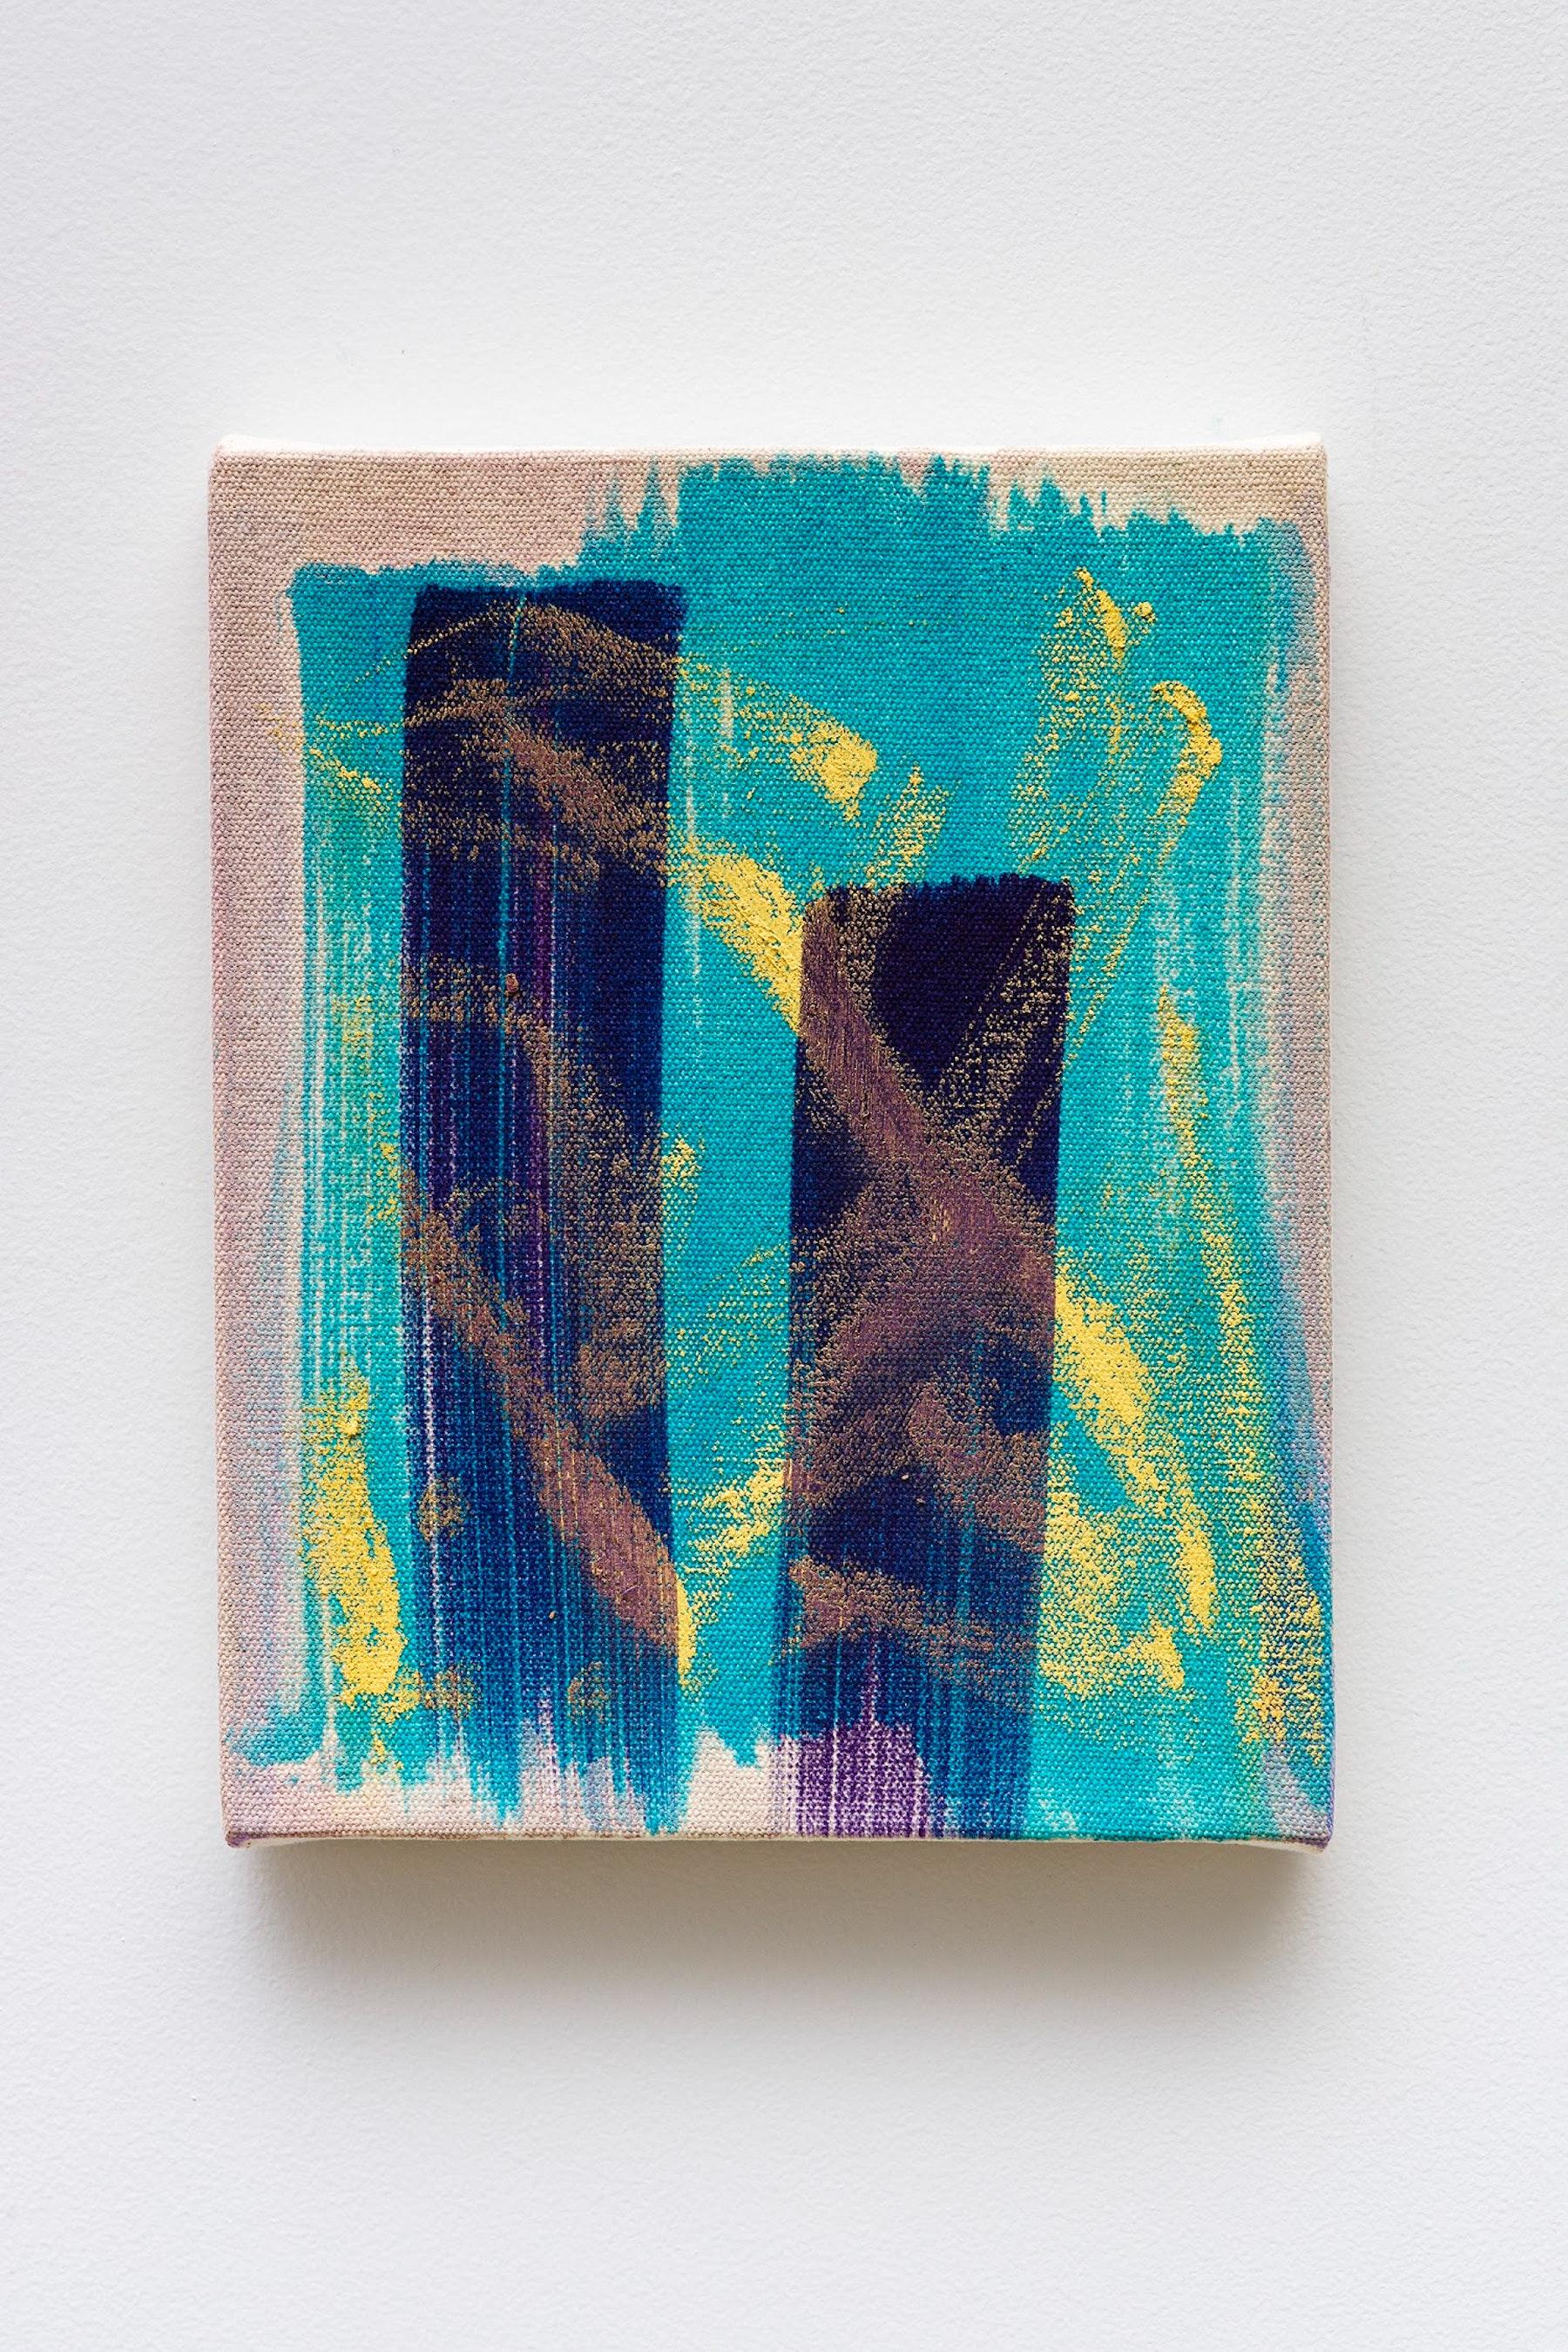 "Monique Van Genderen ""Untitled,"" 2020 Oil on canvas 10 x 8"" [HxW] (25.4 x 20.32 cm) Inventory #VGE389 Courtesy of the artist and Vielmetter Los Angeles Photo credit: Jeff Mclane"